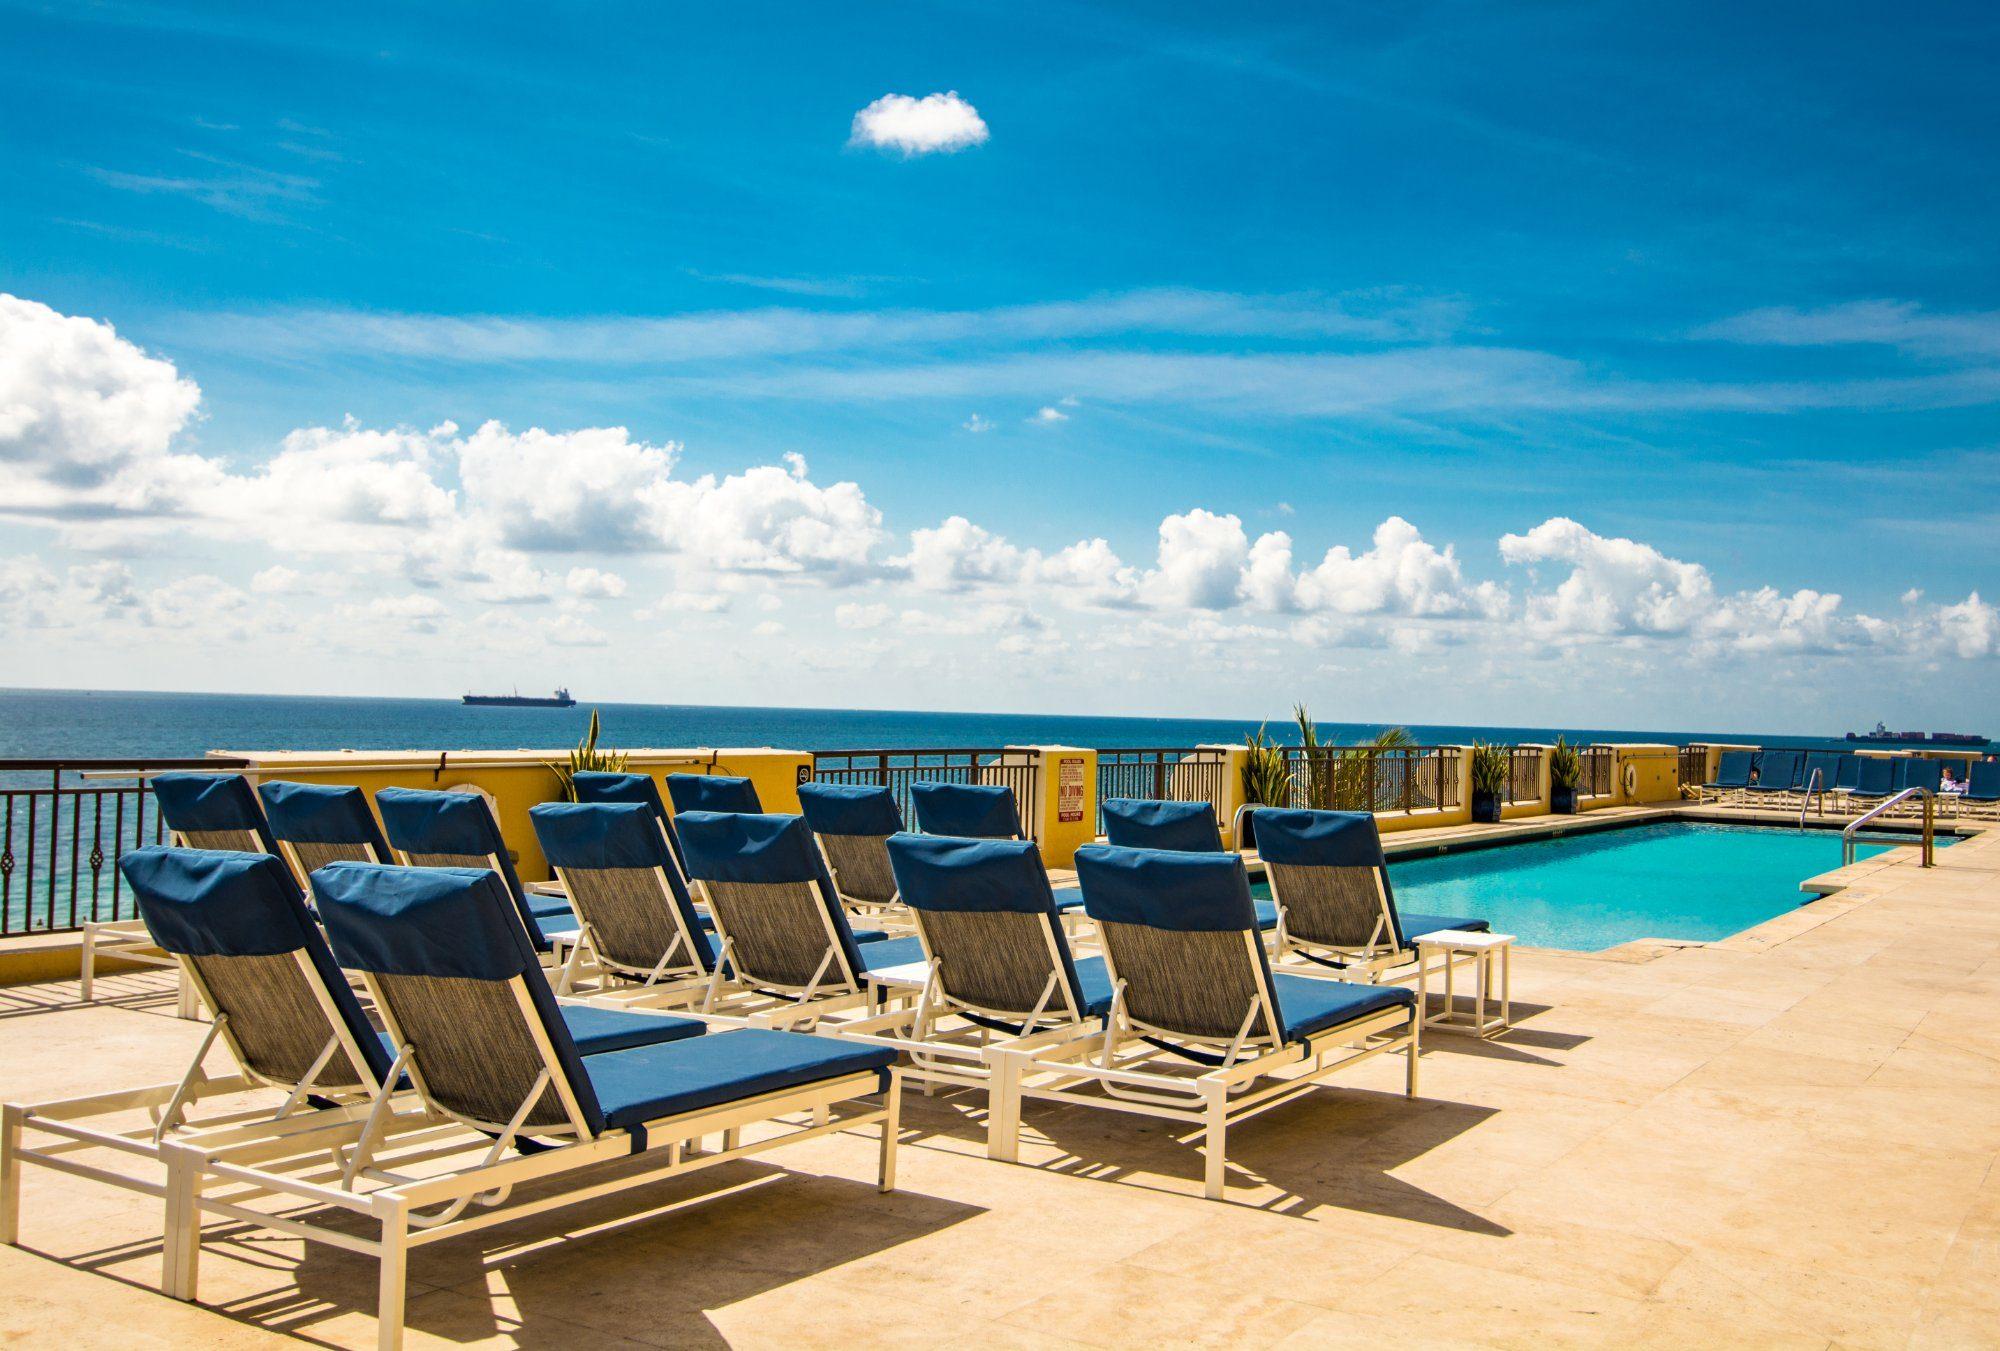 The Atlantic Hotel & Spa, Fort Lauderdale, Florida